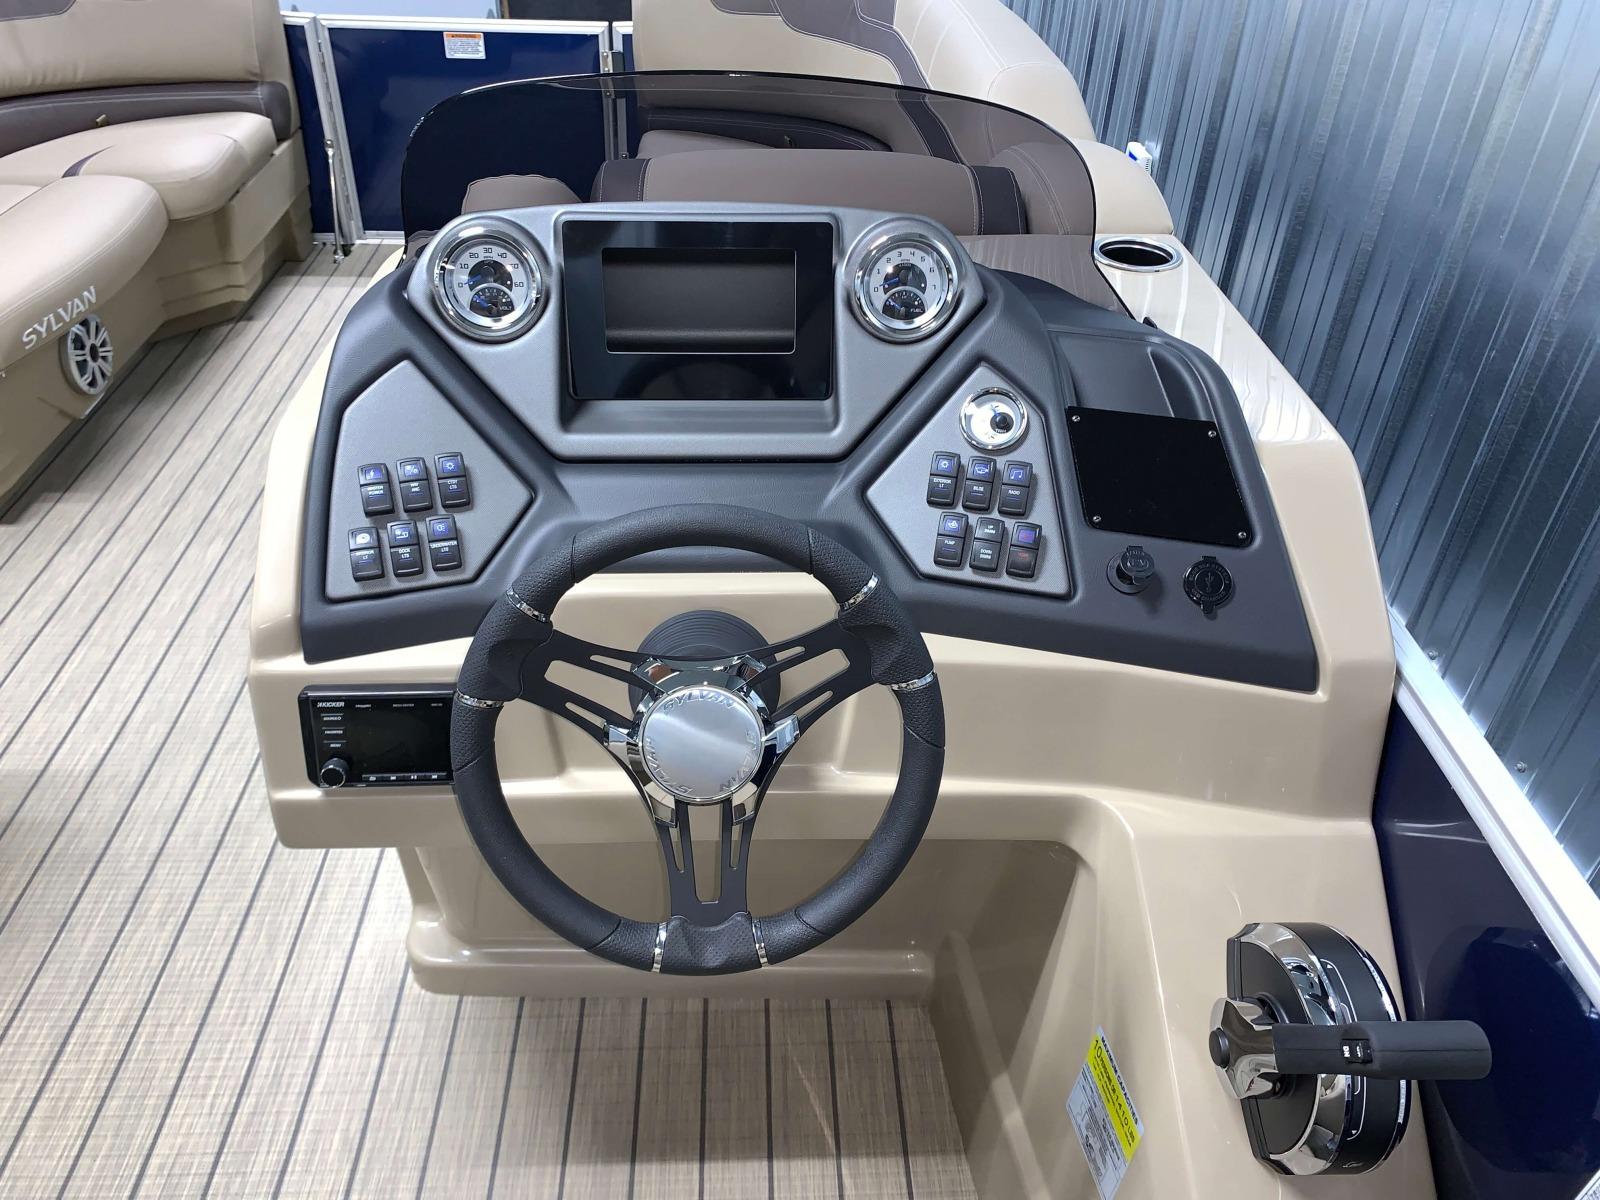 L Series Console of a 2020 Sylvan L1 Cruise Pontoon